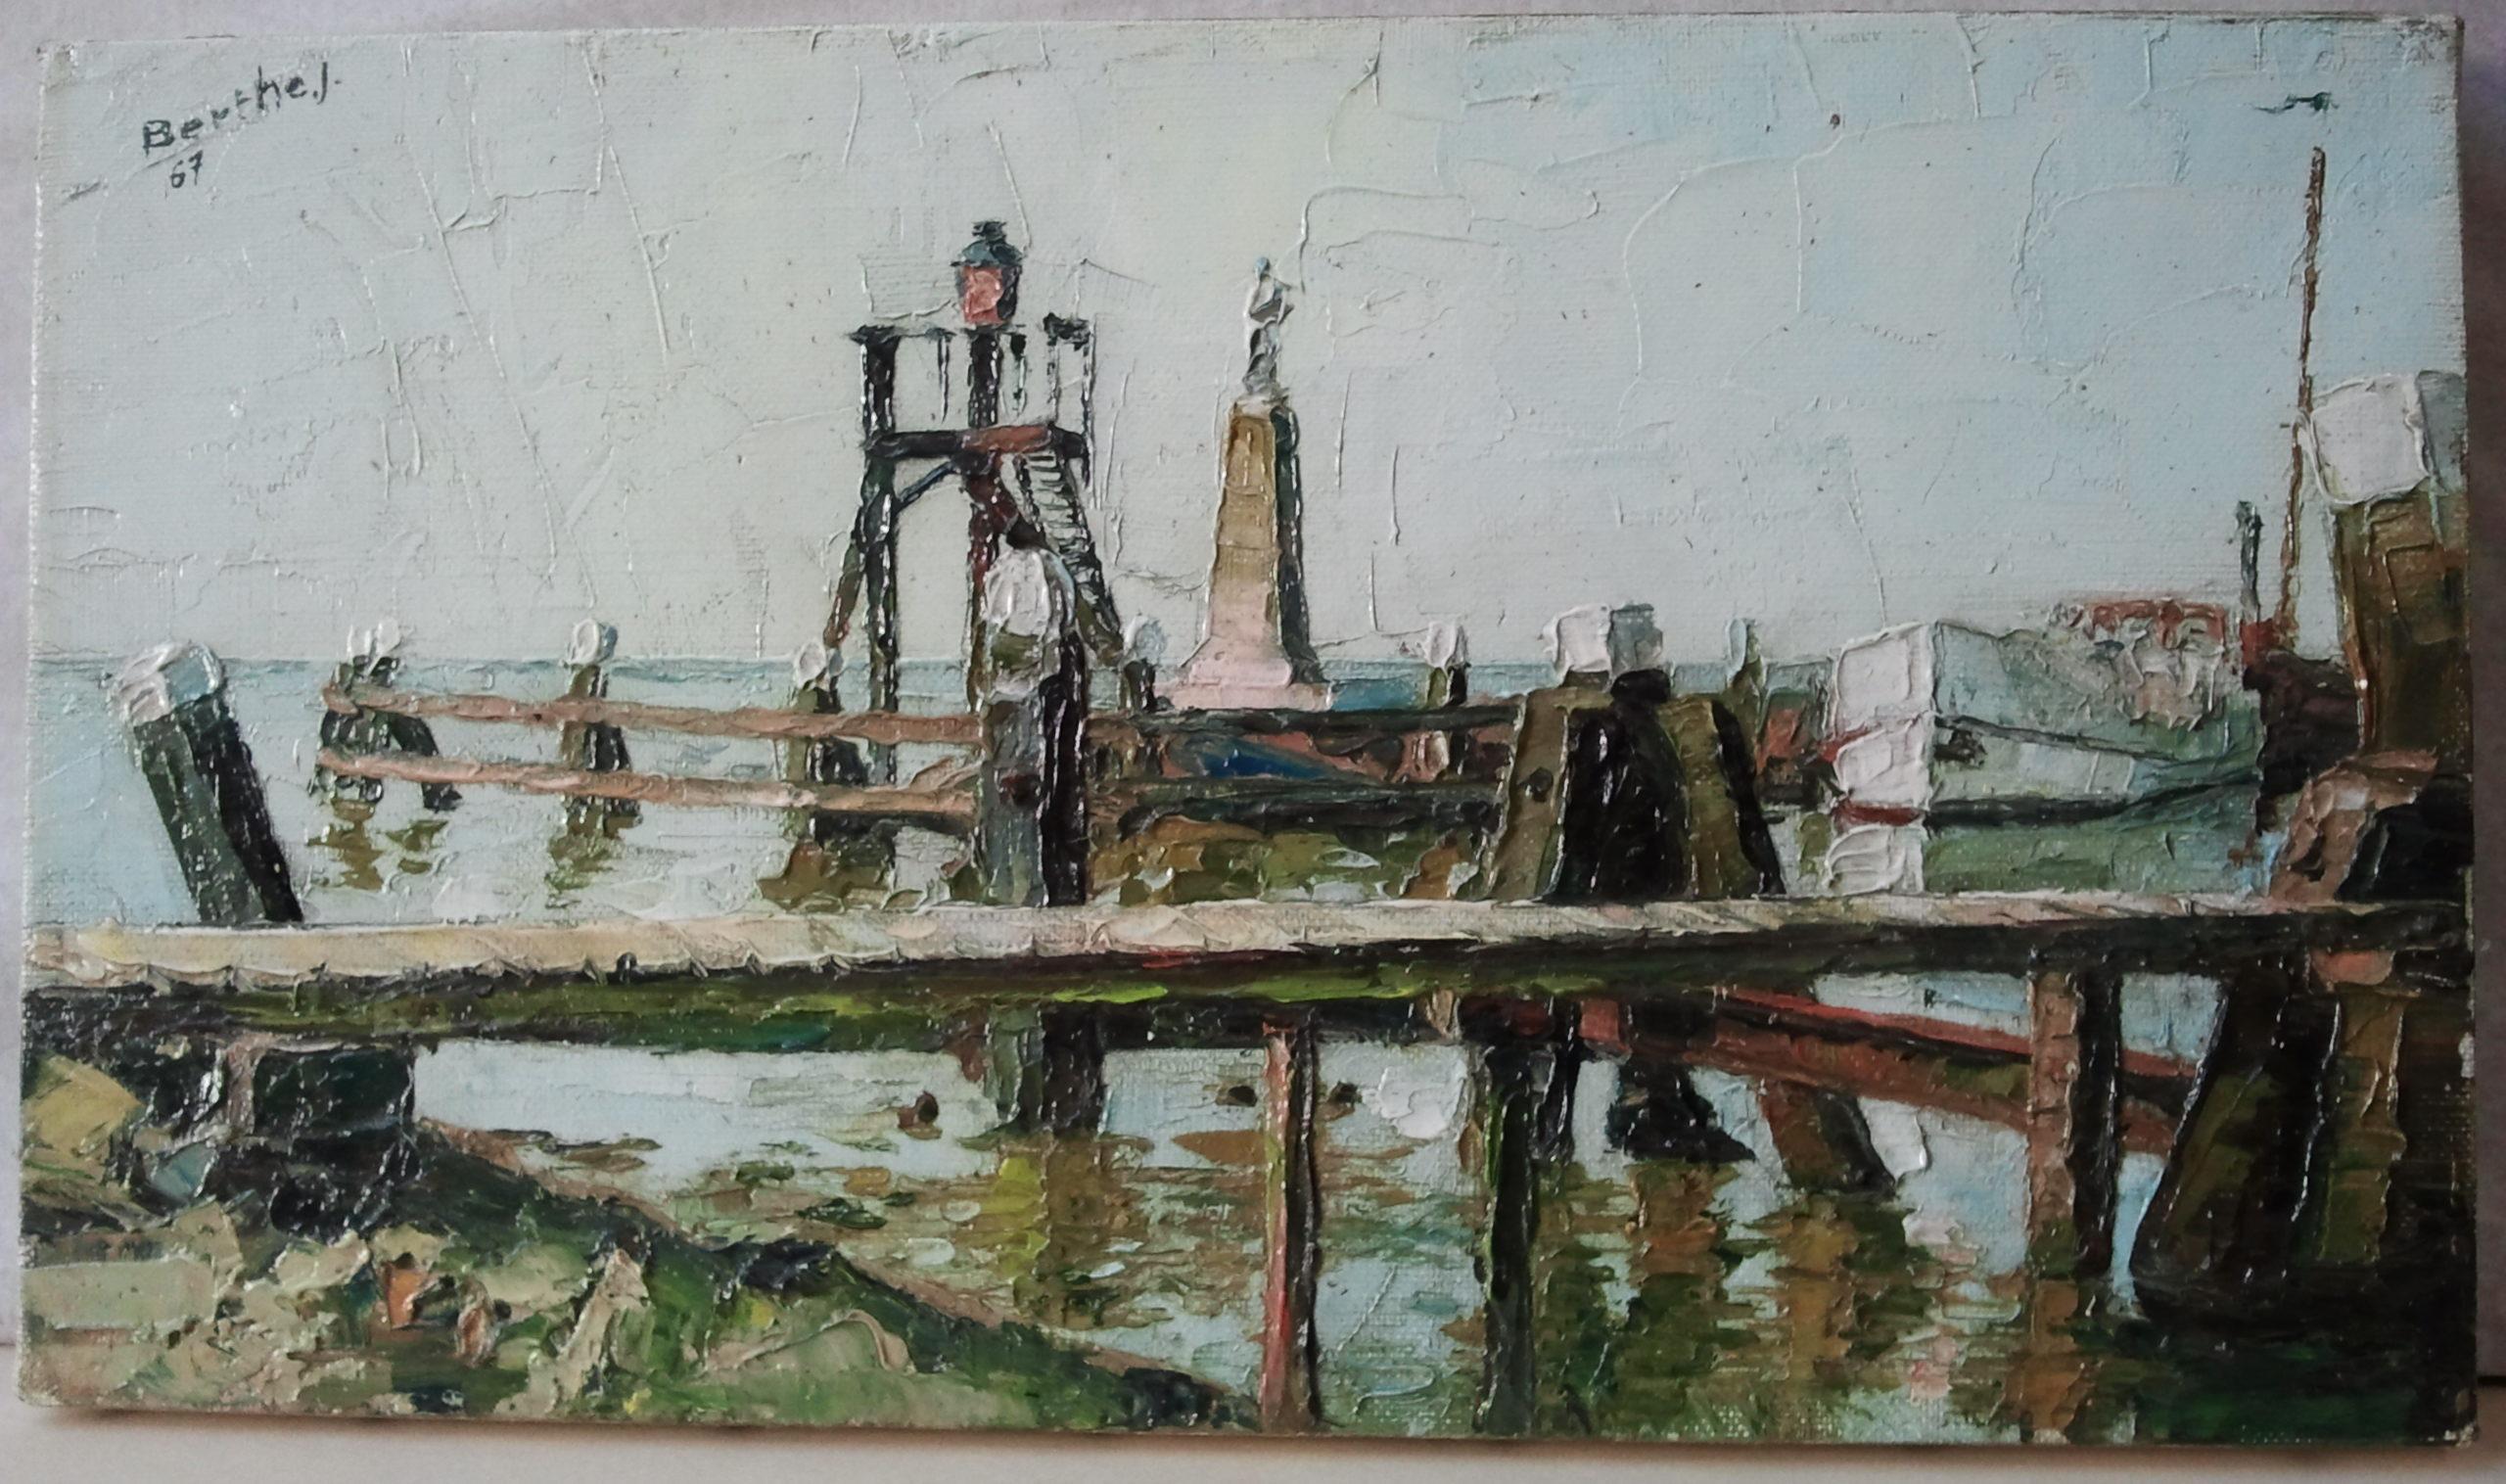 Berthe-Port-de-Volendam-